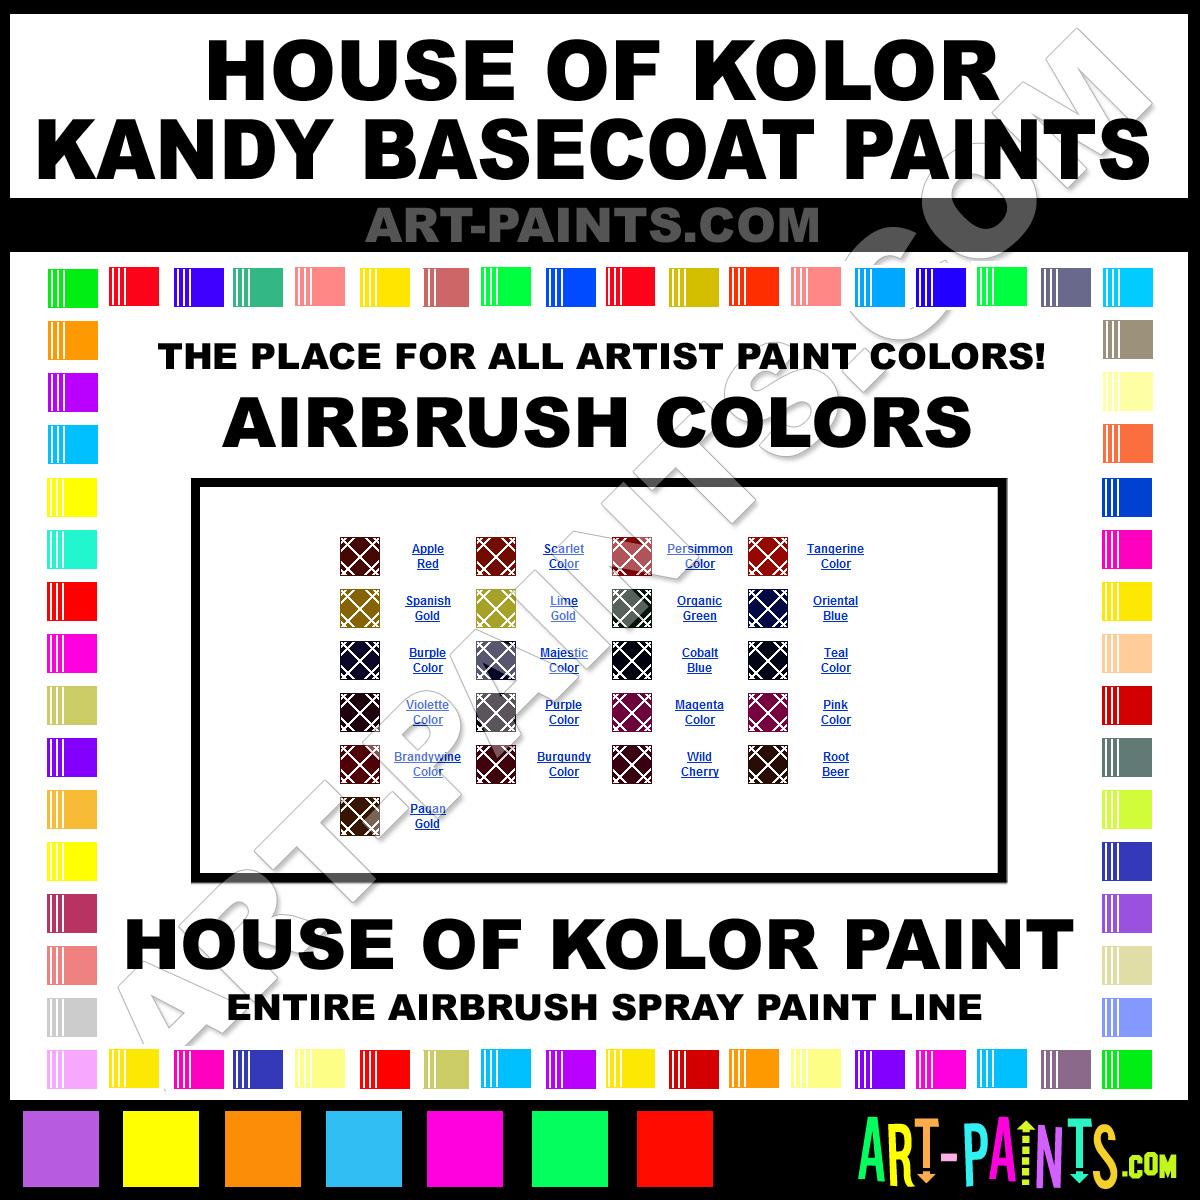 House Of Kolor Kandy Basecoats Airbrush Spray Paint Colors